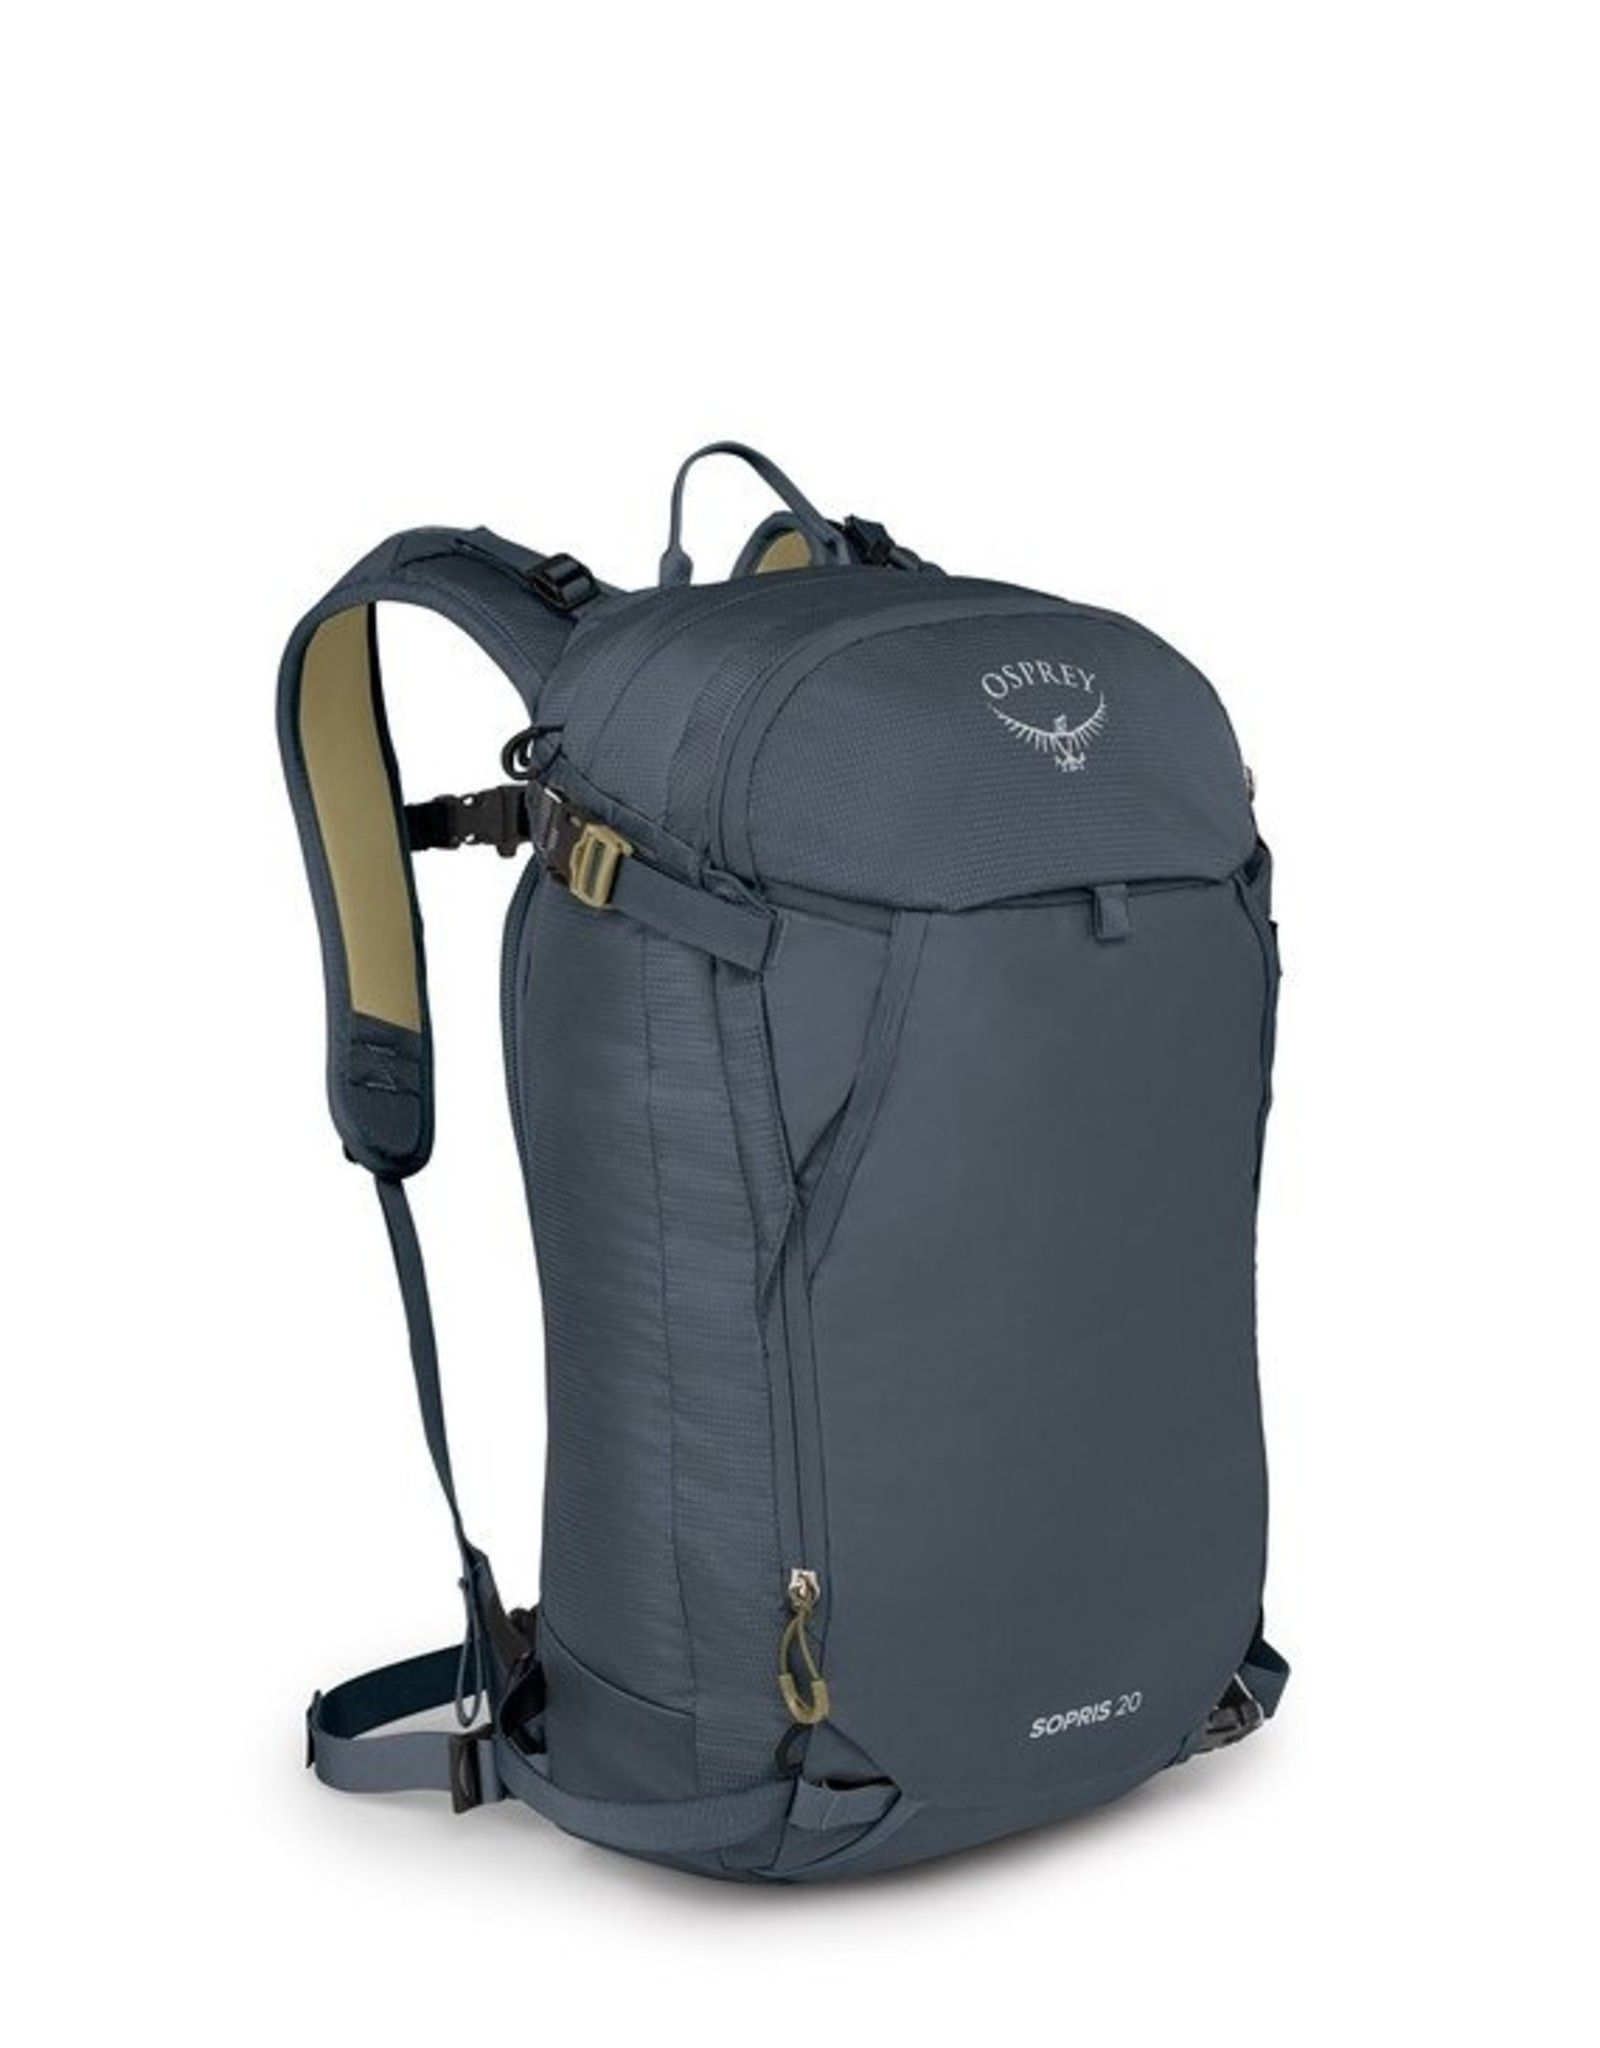 Osprey Osprey Sopris 20 Ski Pack W's O/S